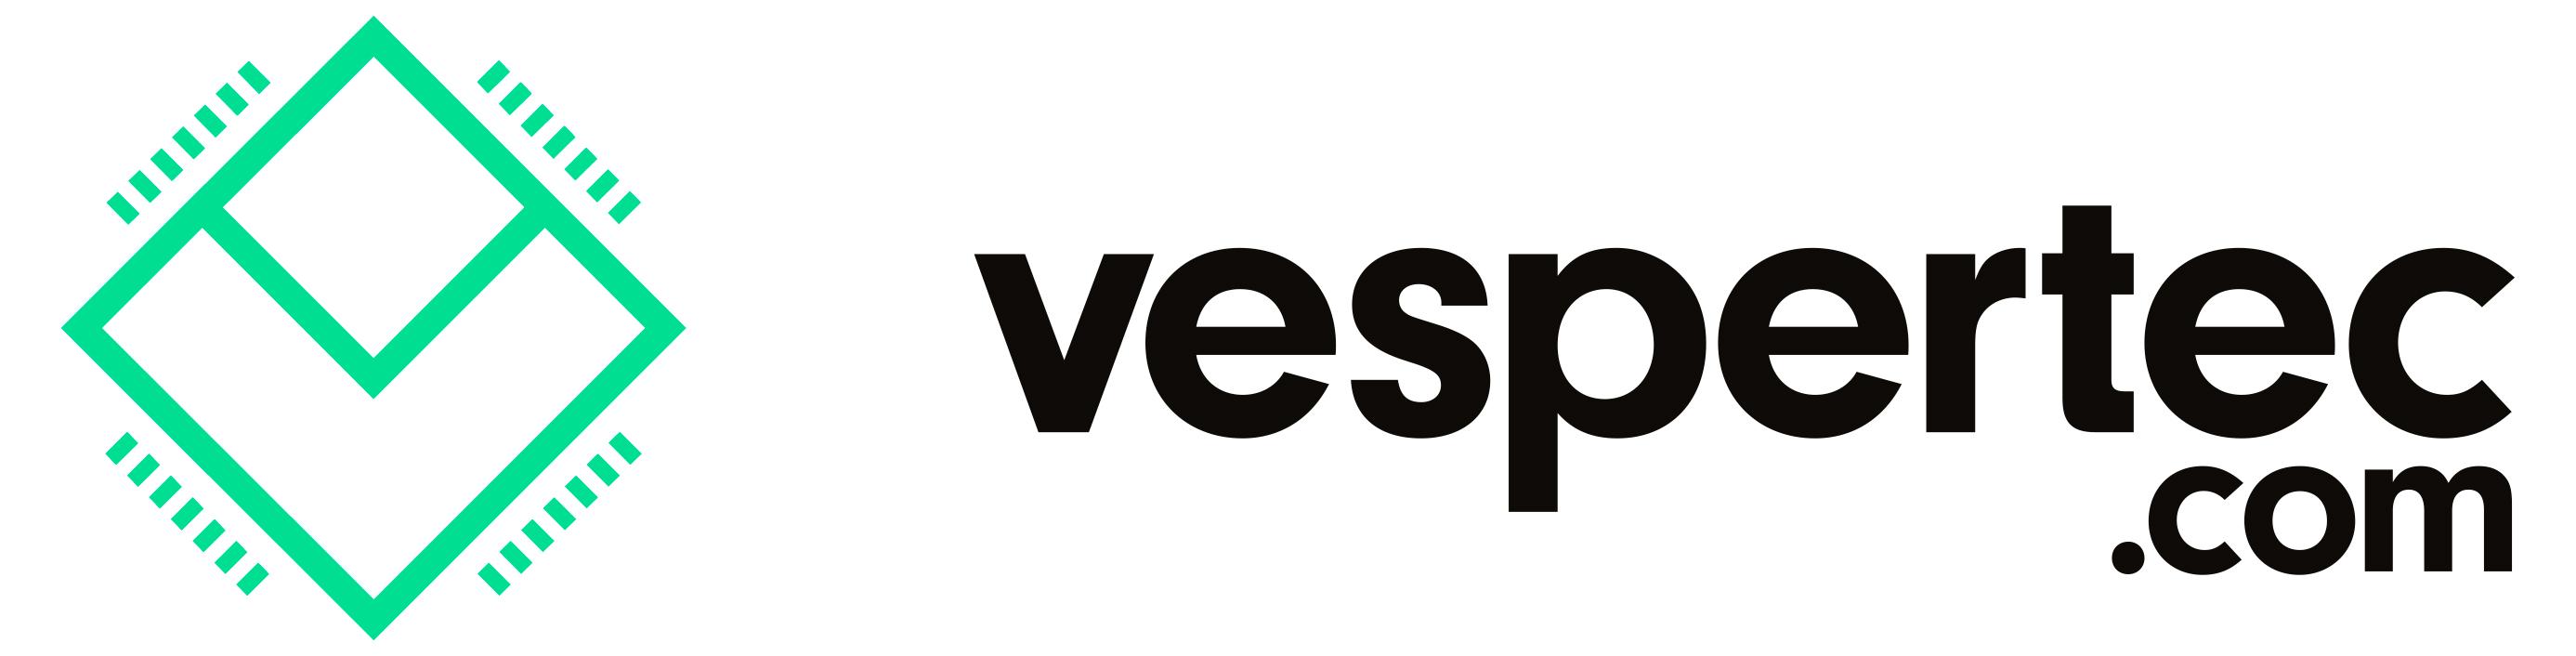 Vesper Technologies logo